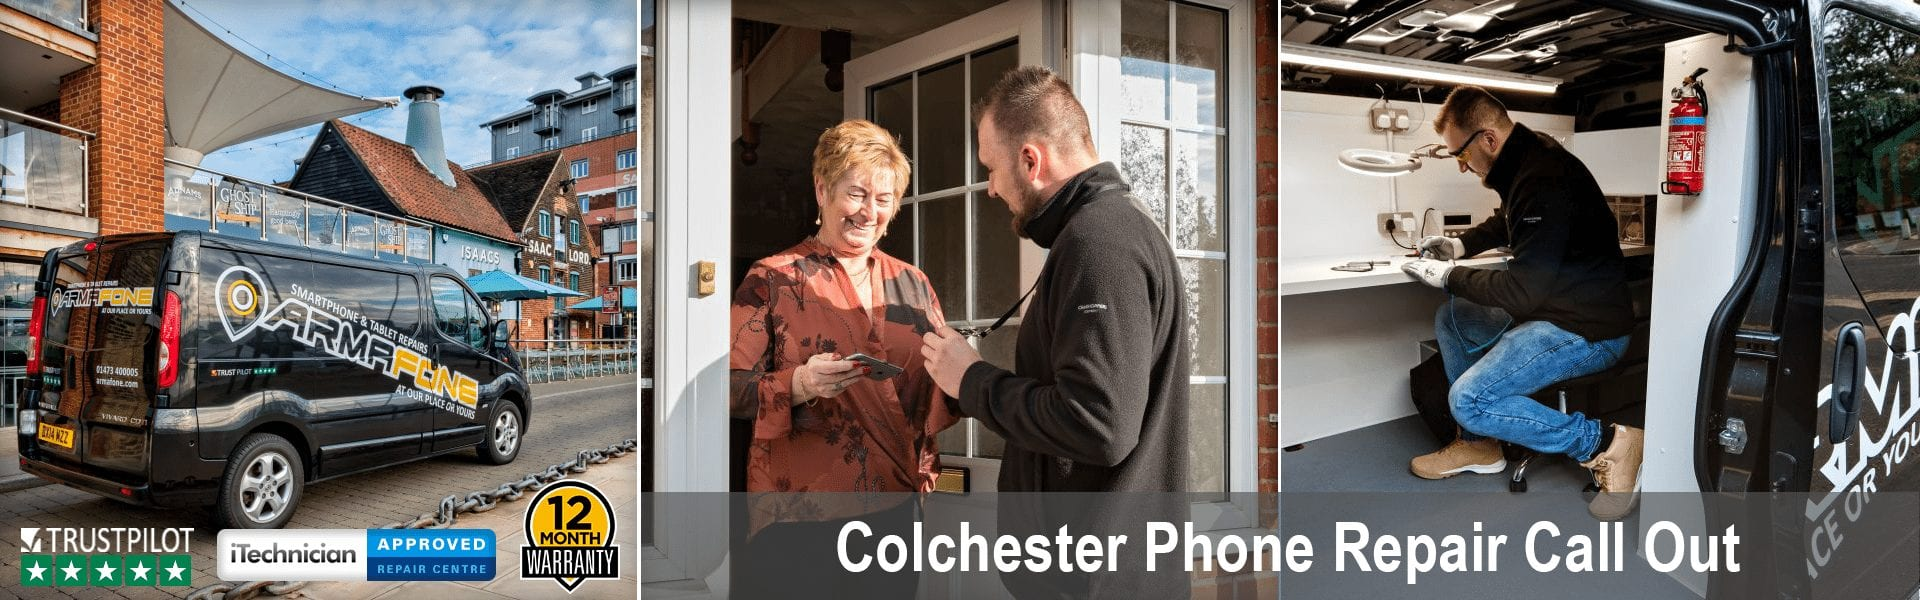 Colchester phone repair header image